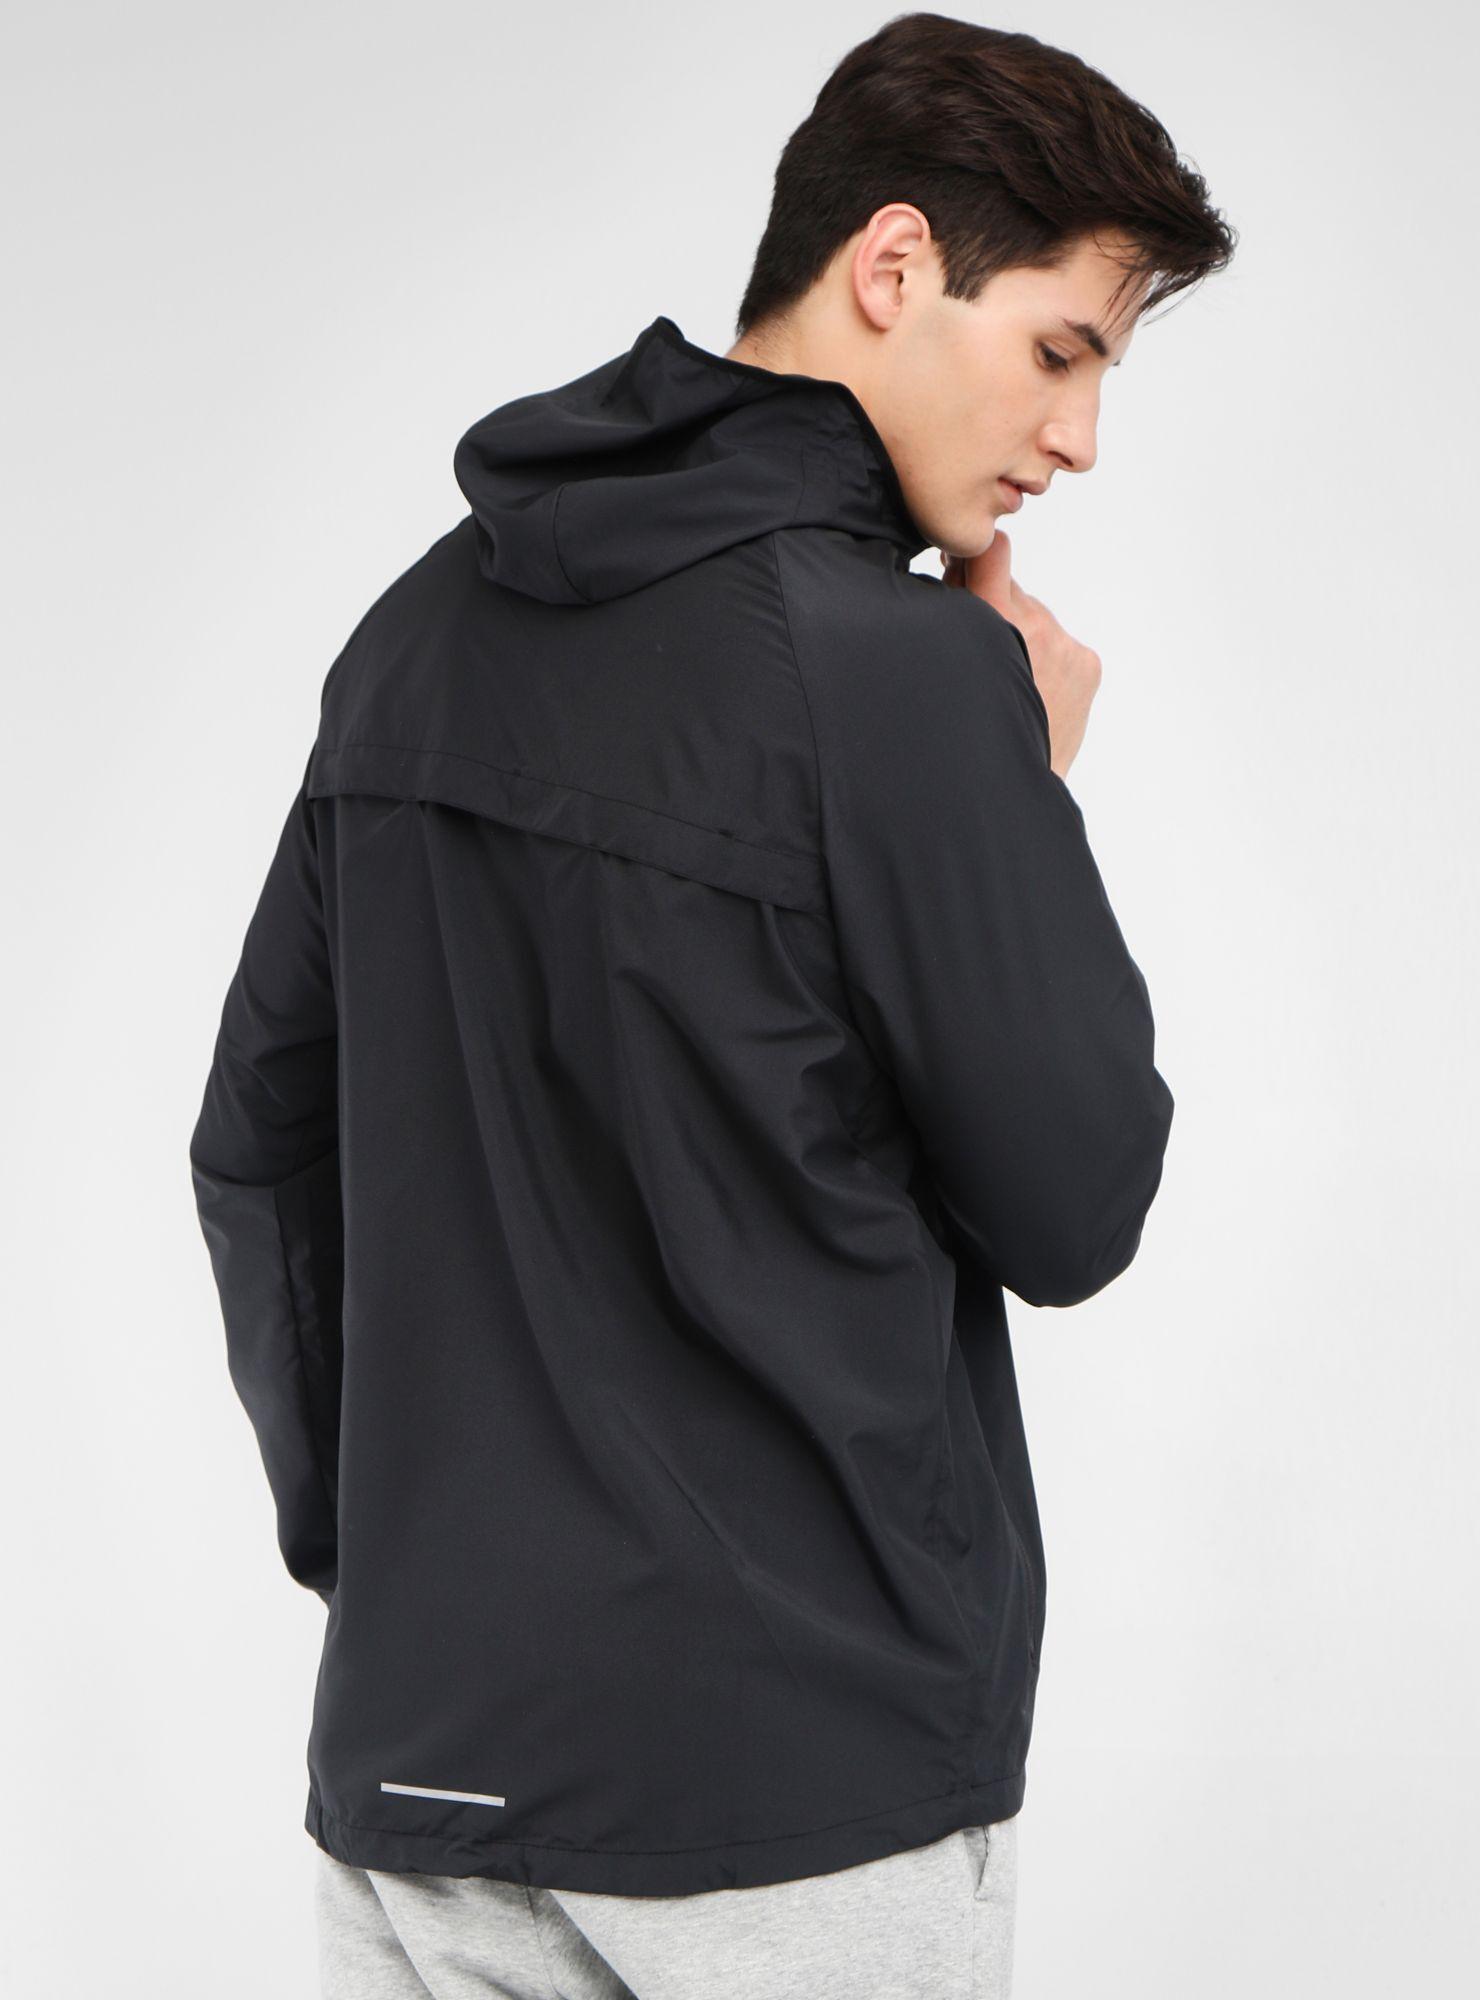 Nike Chaqueta Essential Hooded Running Hombre UVpqSzjLMG